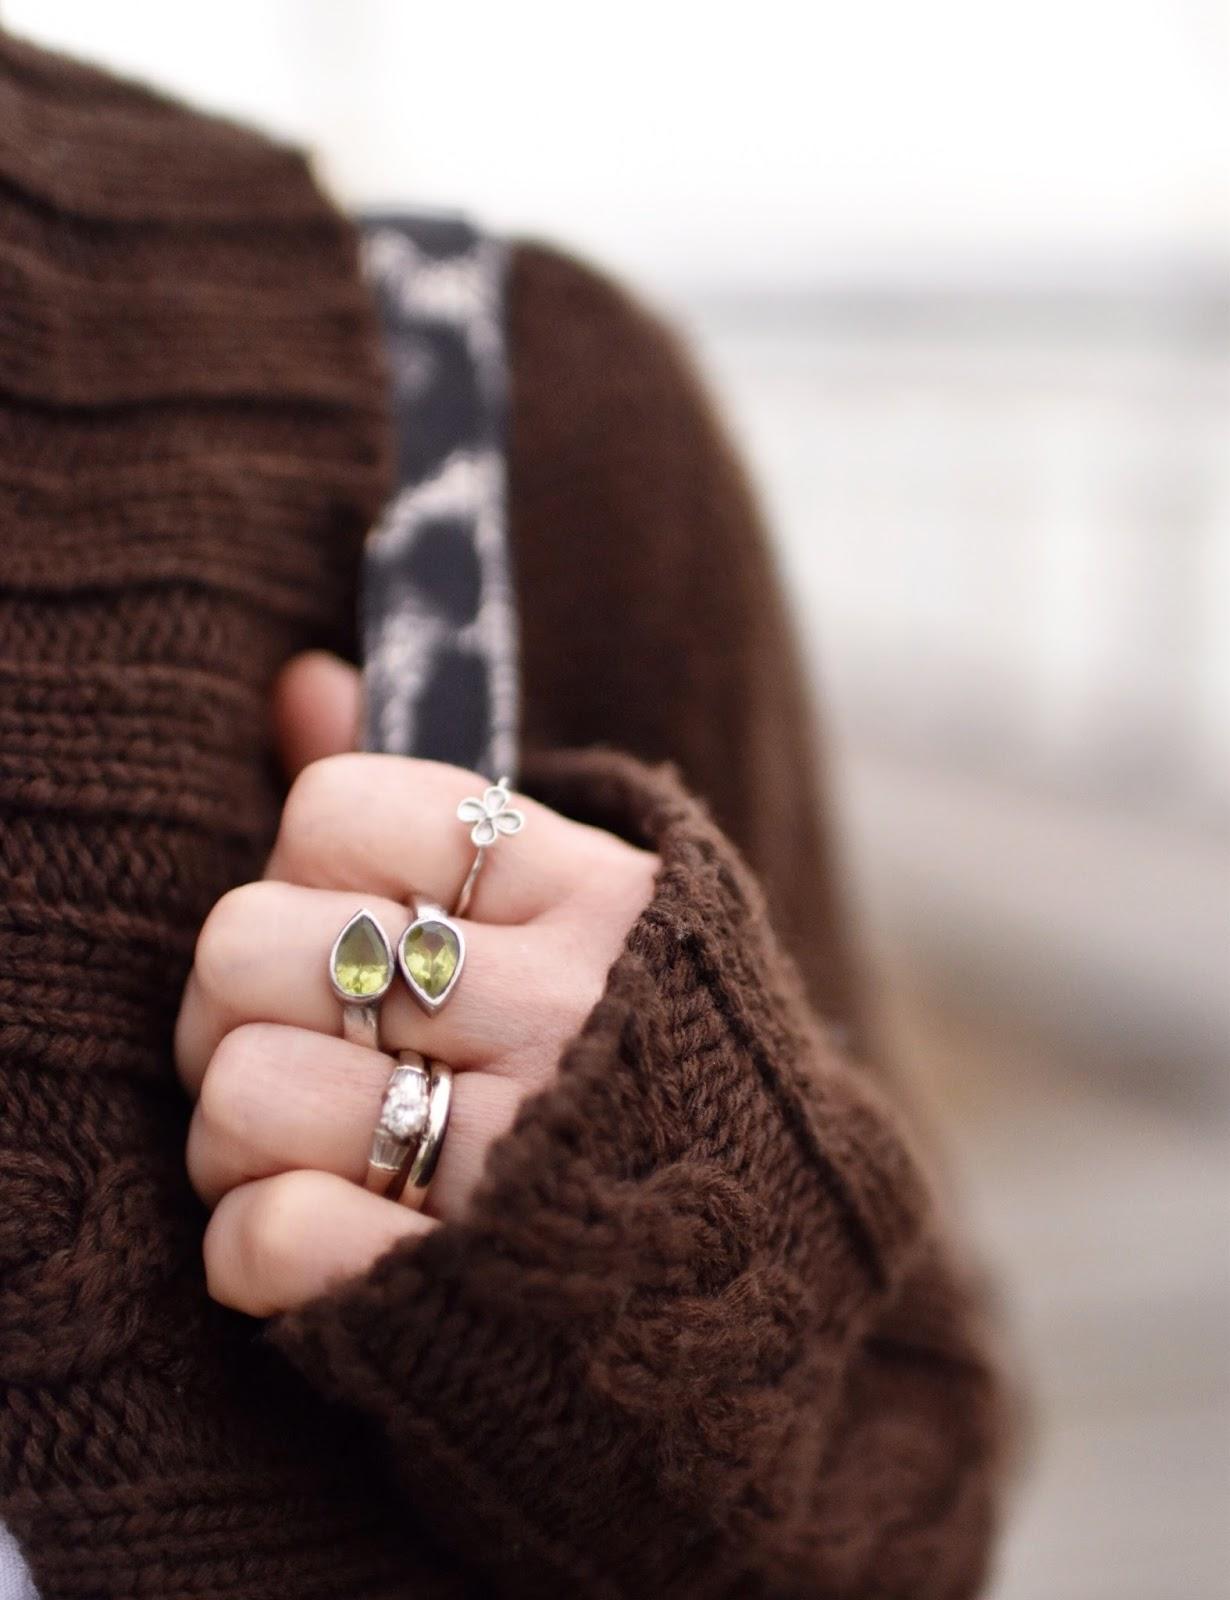 Monika Faulkner outfit inspiration - peridot ring